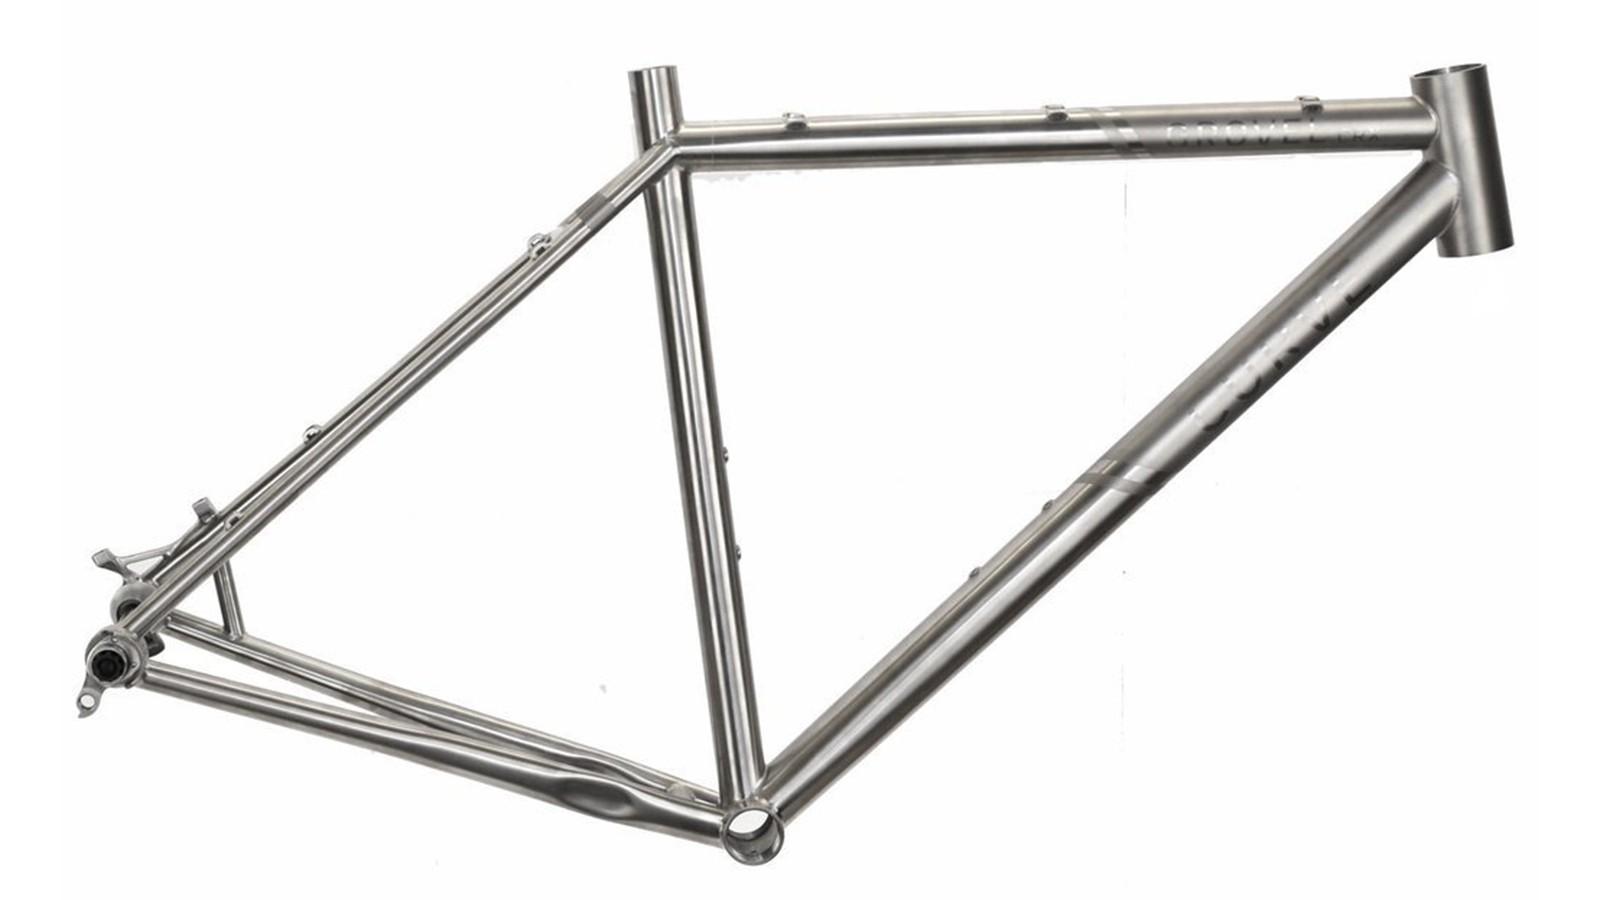 Curve's CXR titanium frame